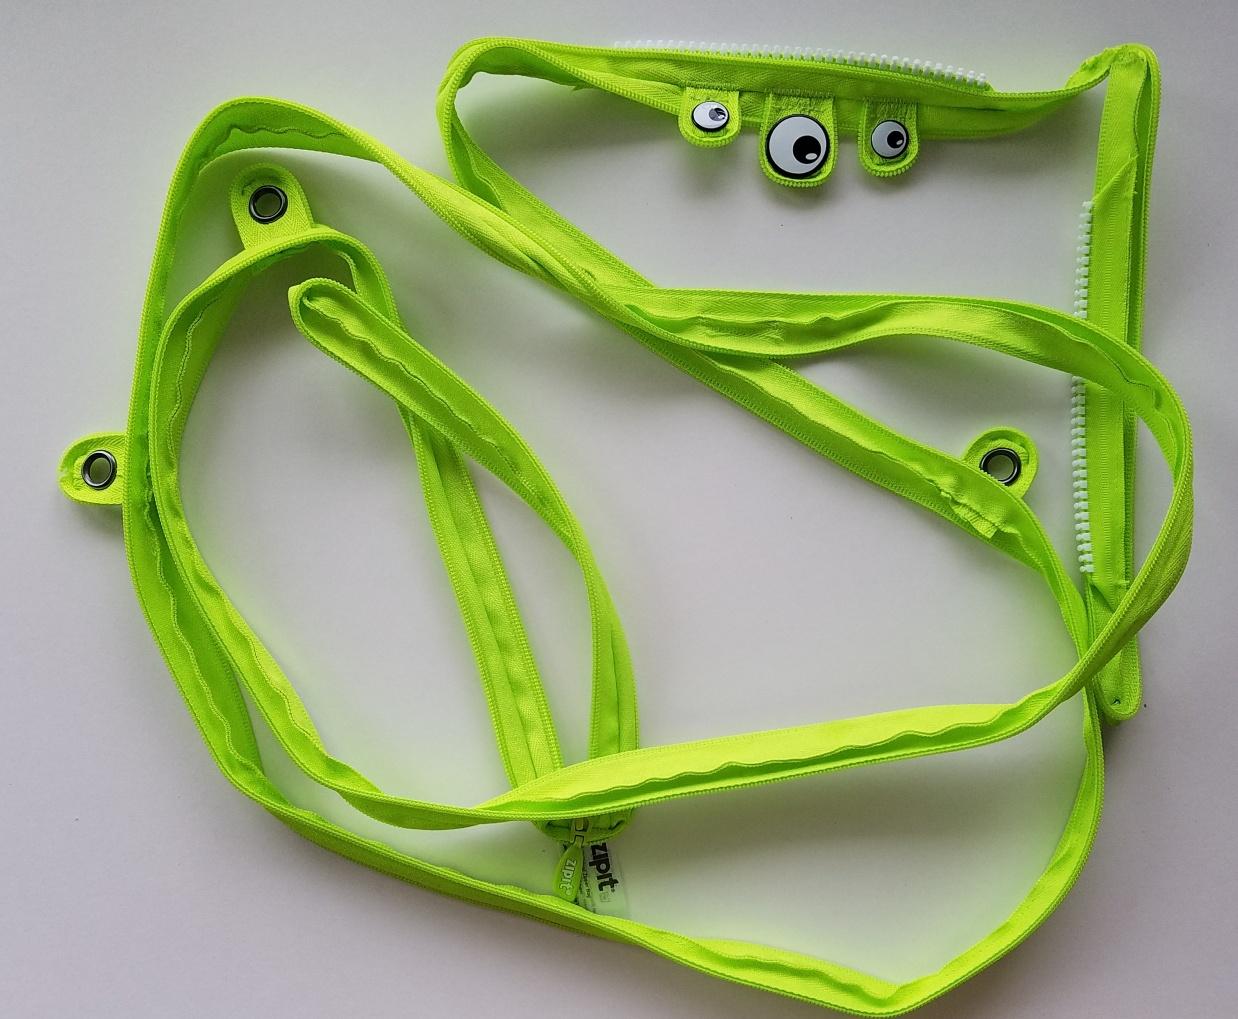 Monster Zip/Unzip Calm Down Tool - Mrs  Bell The Crafty